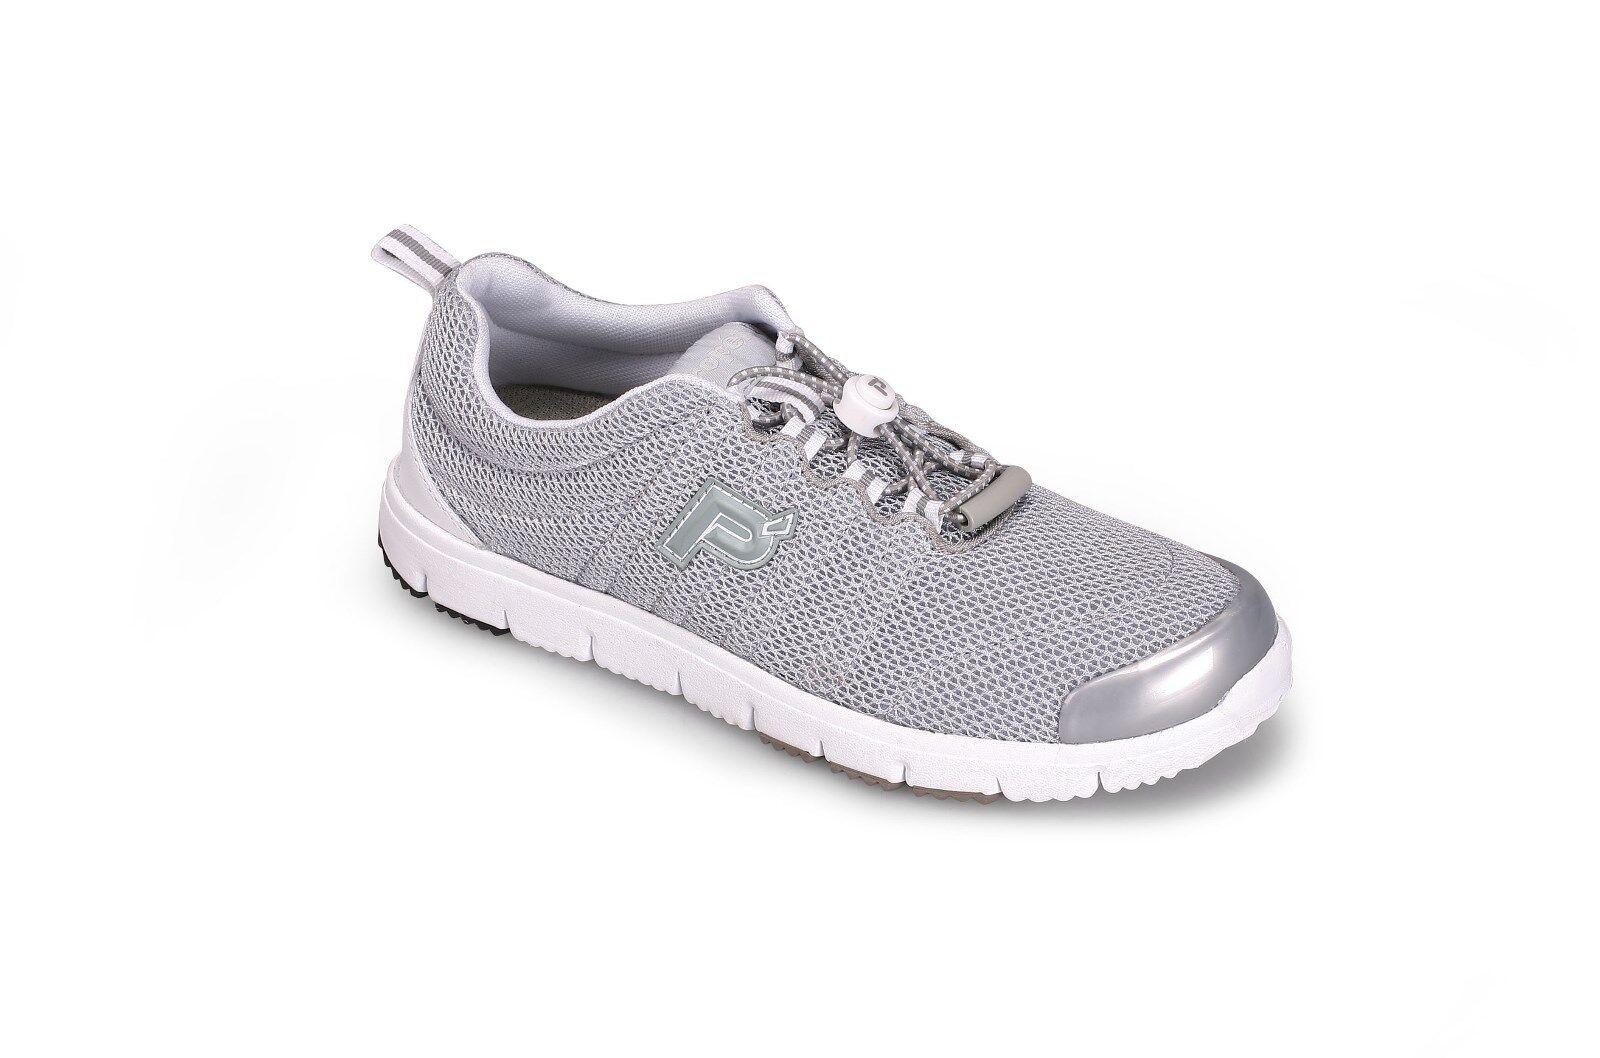 Propet Damens Travel Walker Light II W3239 - Silver Light Walker Weight Sneaker fc08af